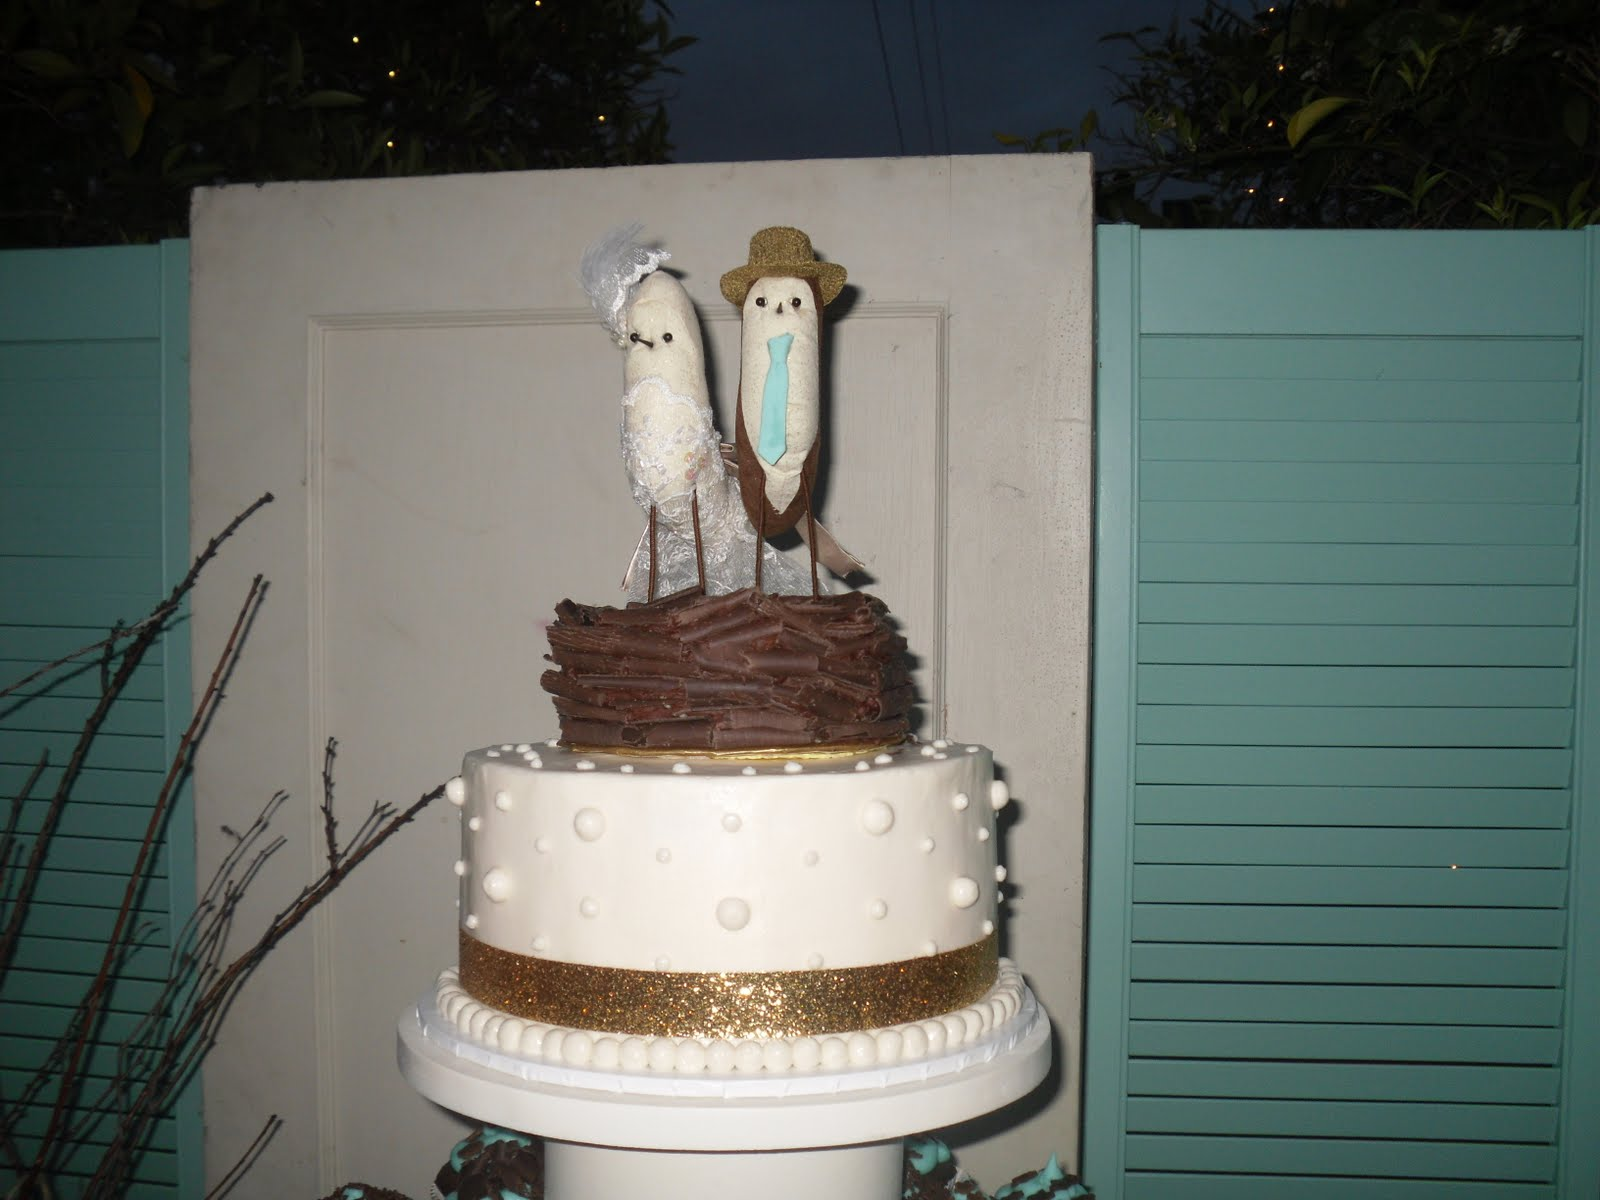 Unique Wedding Cake - Wedding Cake #2040082 - Weddbook